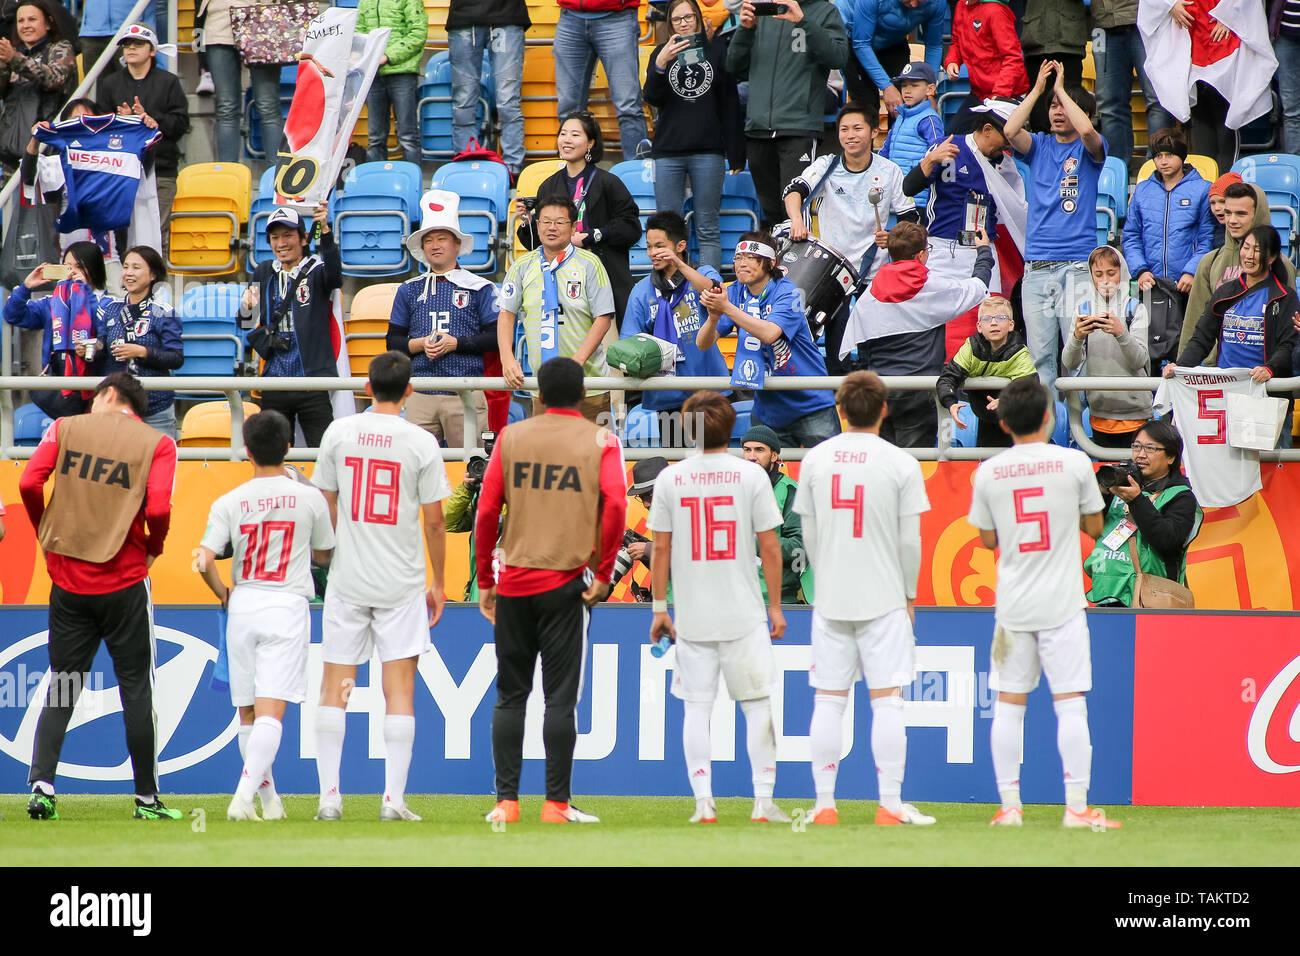 Gdynia Stadium, Gdynia, Poland - 26th May, 2019: Mitsuki Saito (c), Taichi Hara, Kota Yamada, Ayumu Seko, Yukinari Sugawara from Japan are seen celebrates victory with Japan fans after FIFA U-20 World Cup match between Mexico and Japan (GROUP B) in Gdynia. (Final score; Mexico 0:3 Japan) - Stock Image